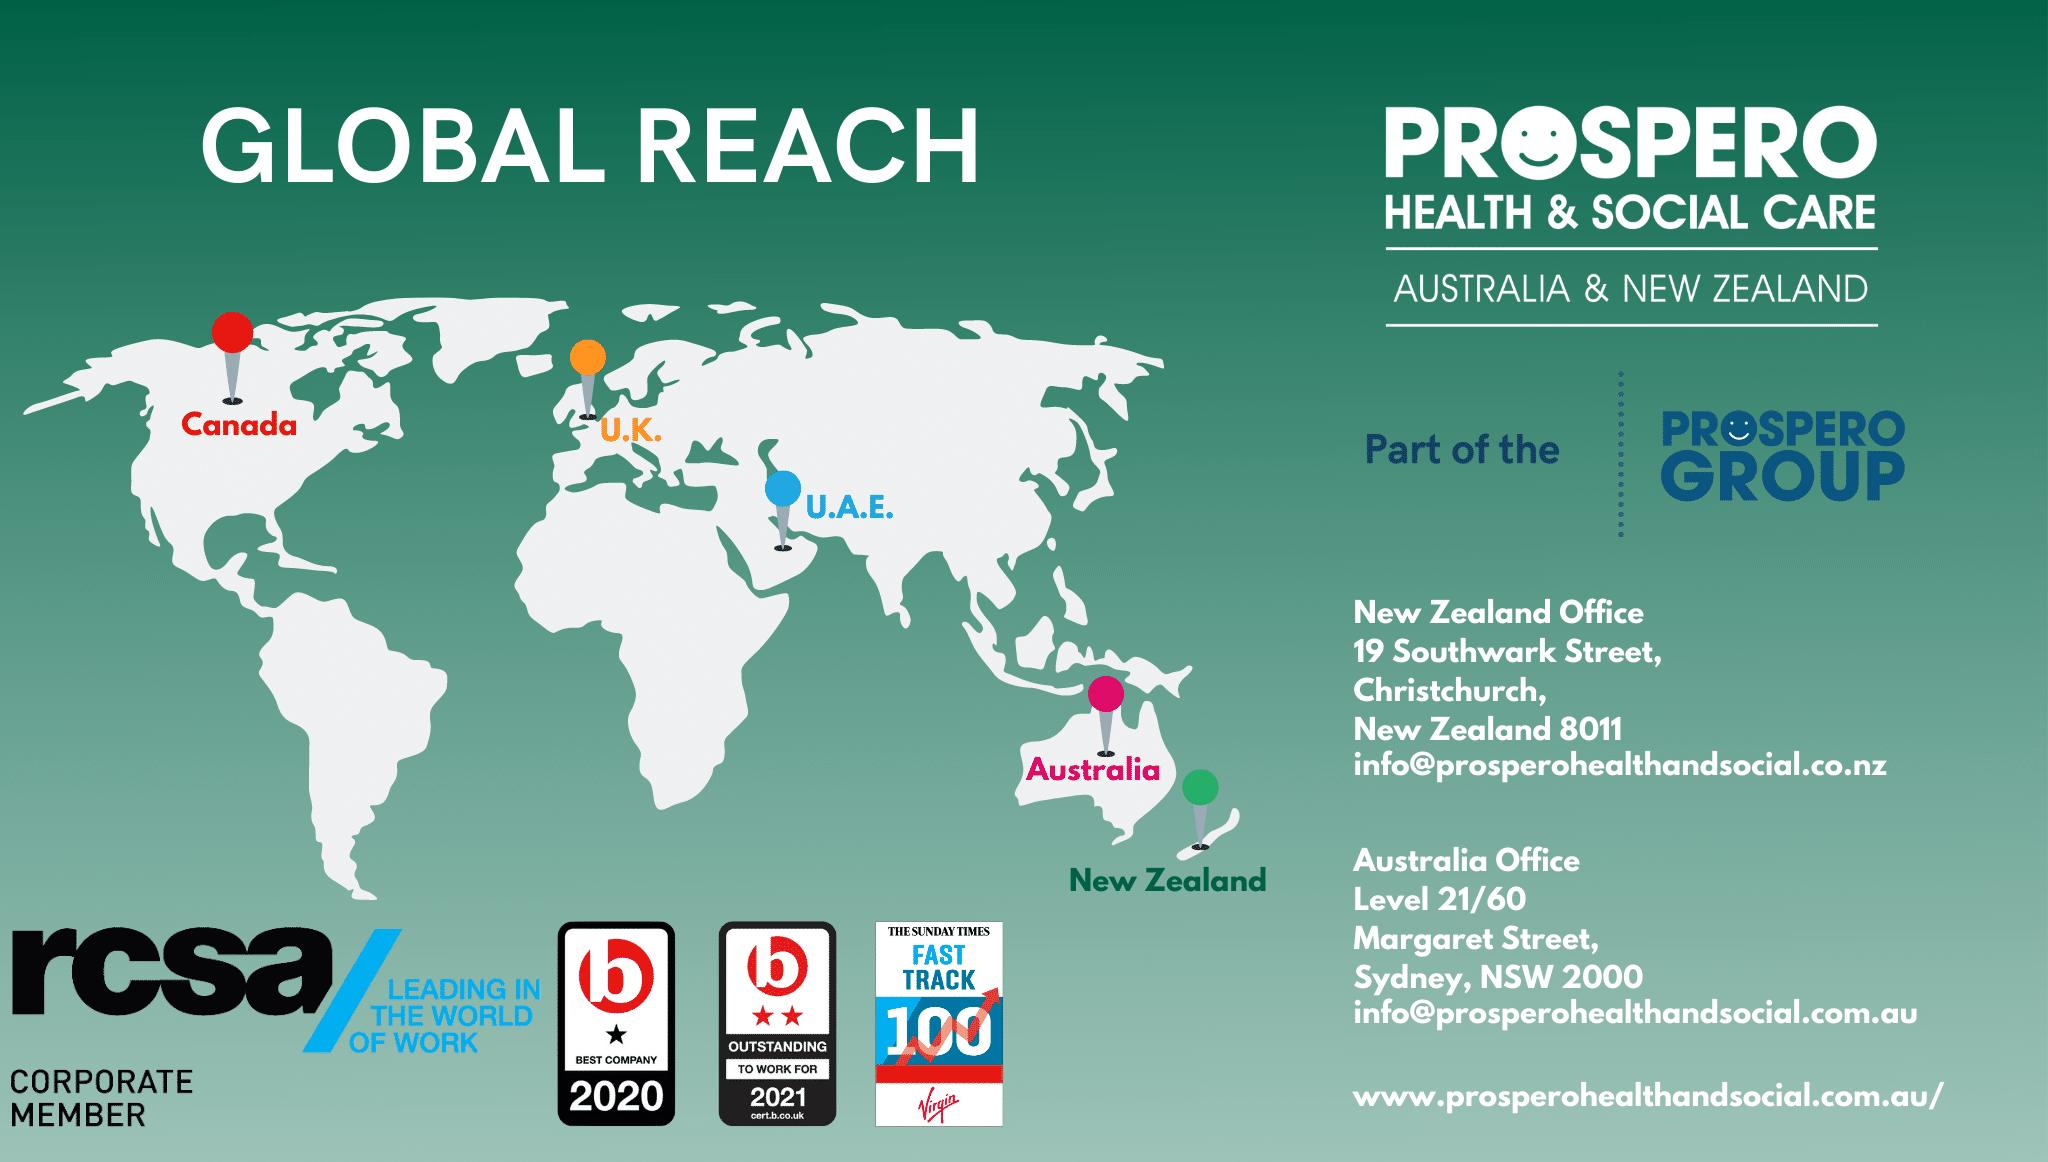 Global reach AUS NZ